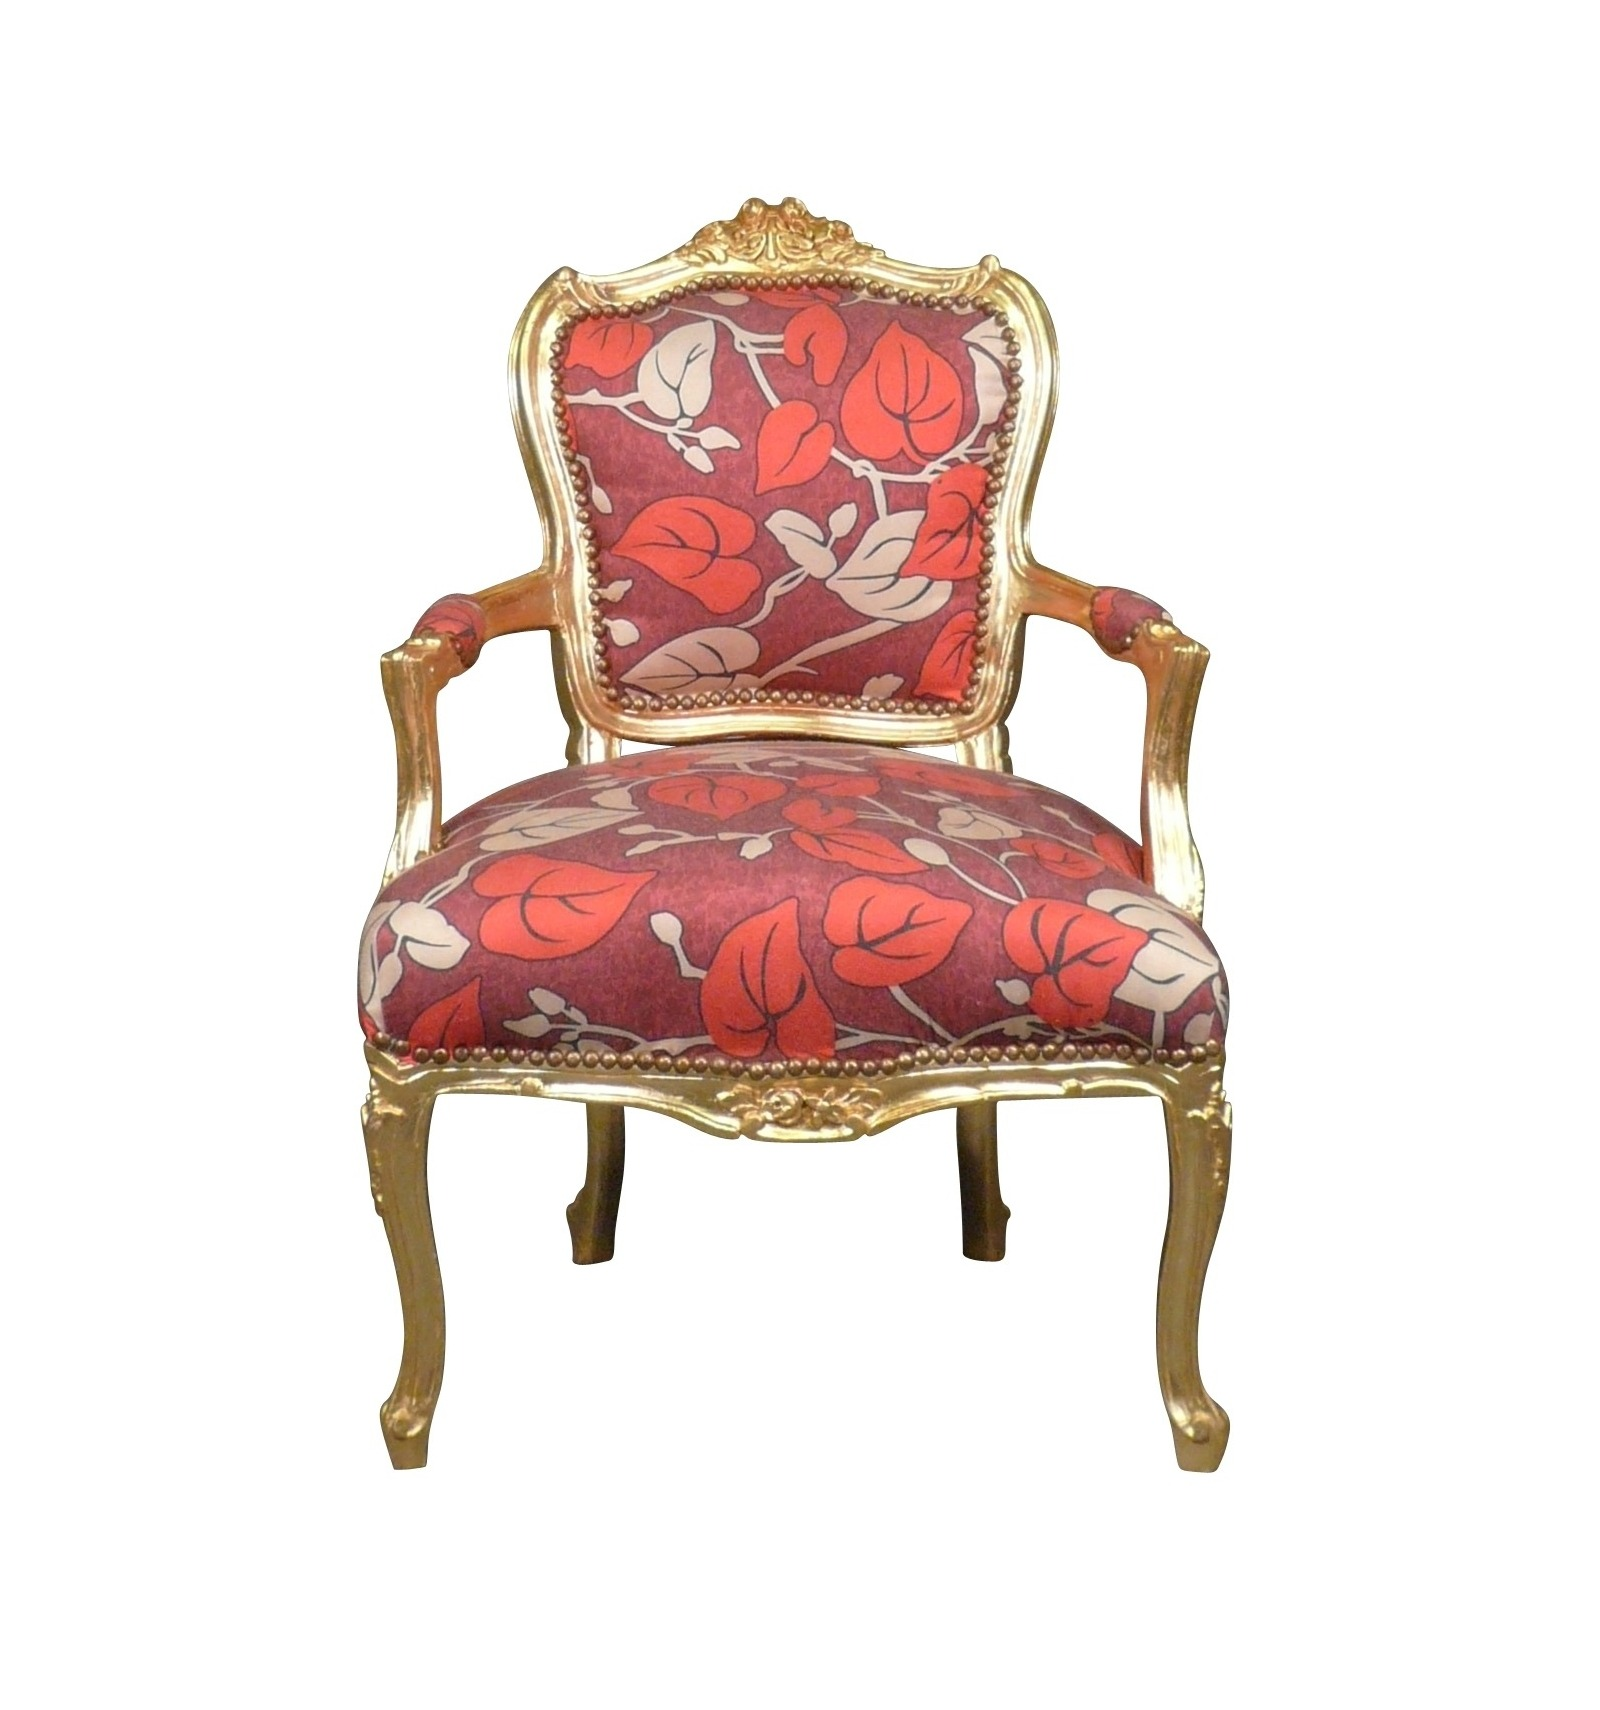 Chaise Salle A Manger Louis Xv fauteuil louis xv